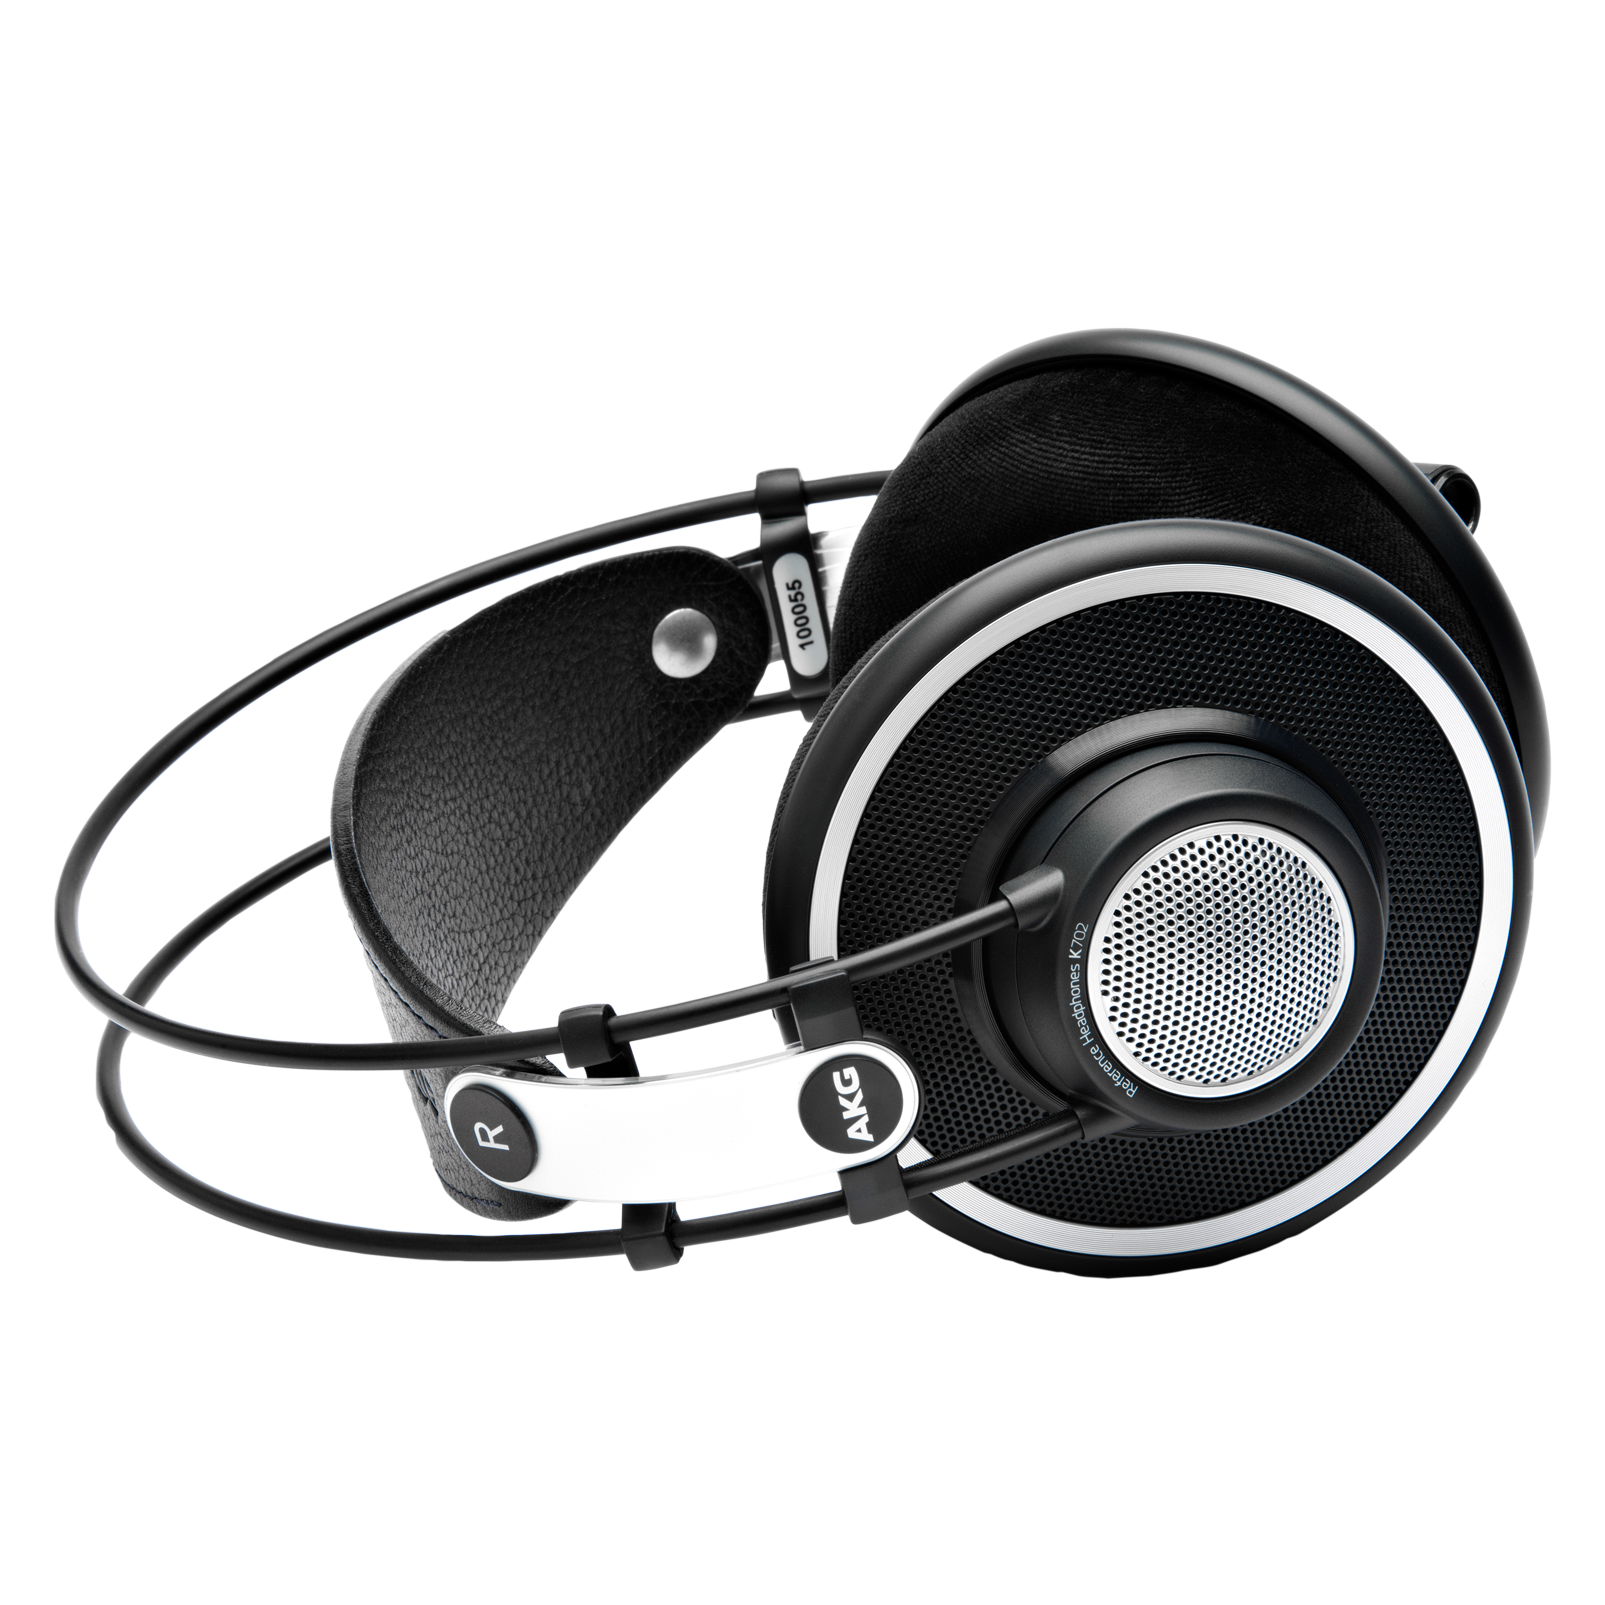 K702 - Black - Reference studio headphones - Detailshot 3